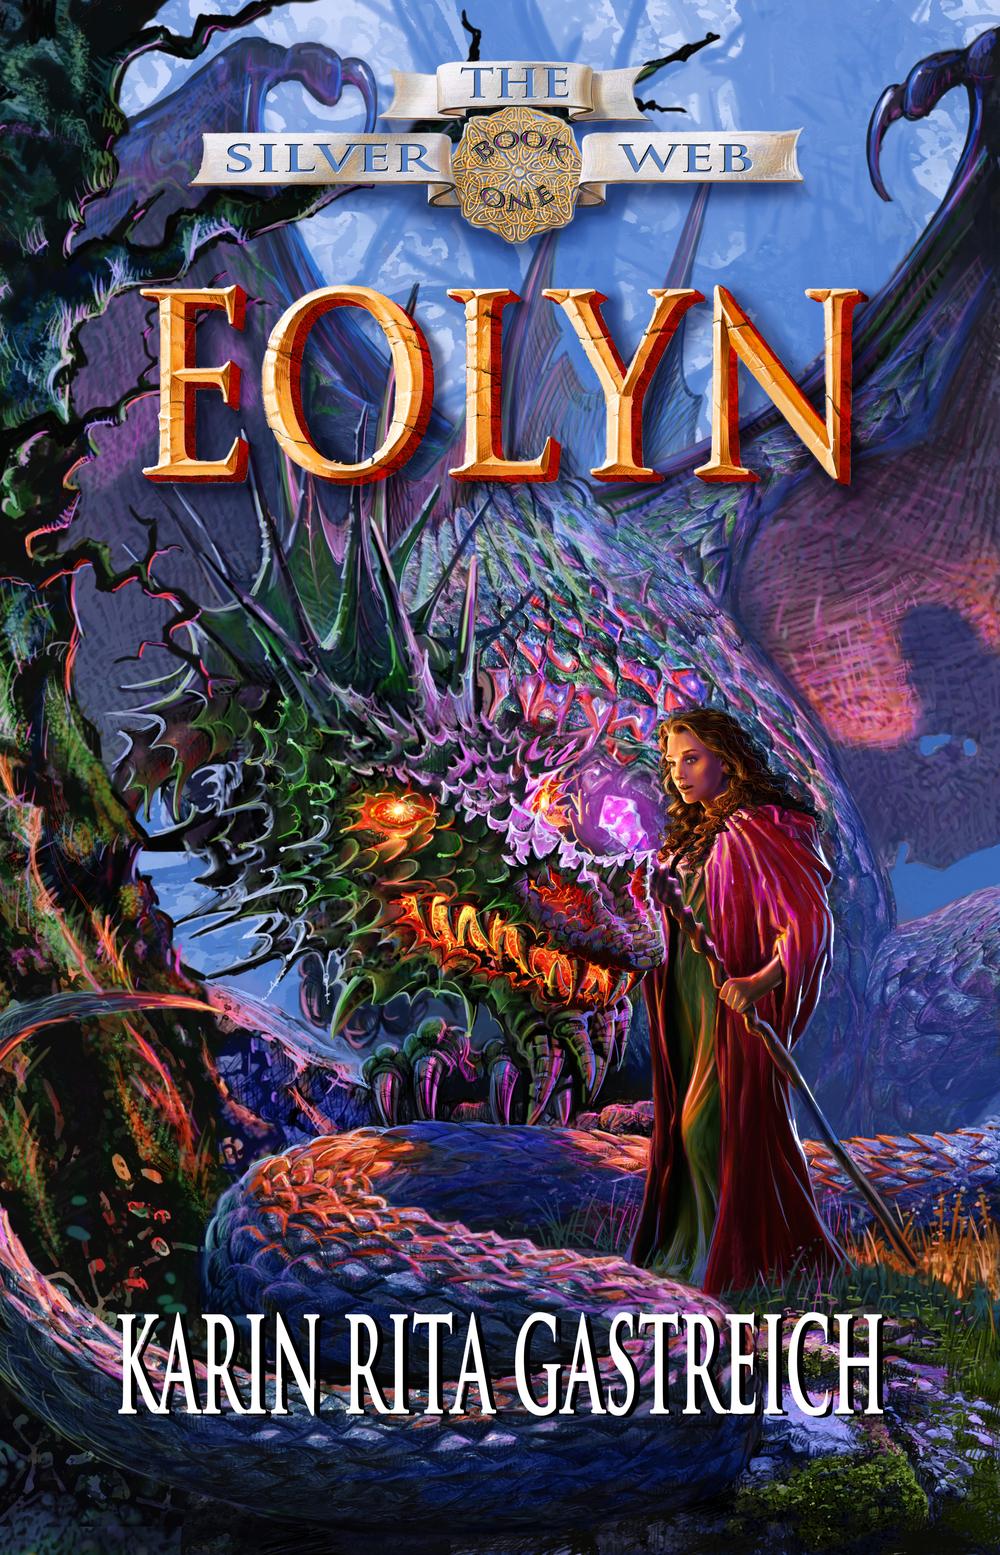 Eolyn cover flat 2 22 16 .jpg